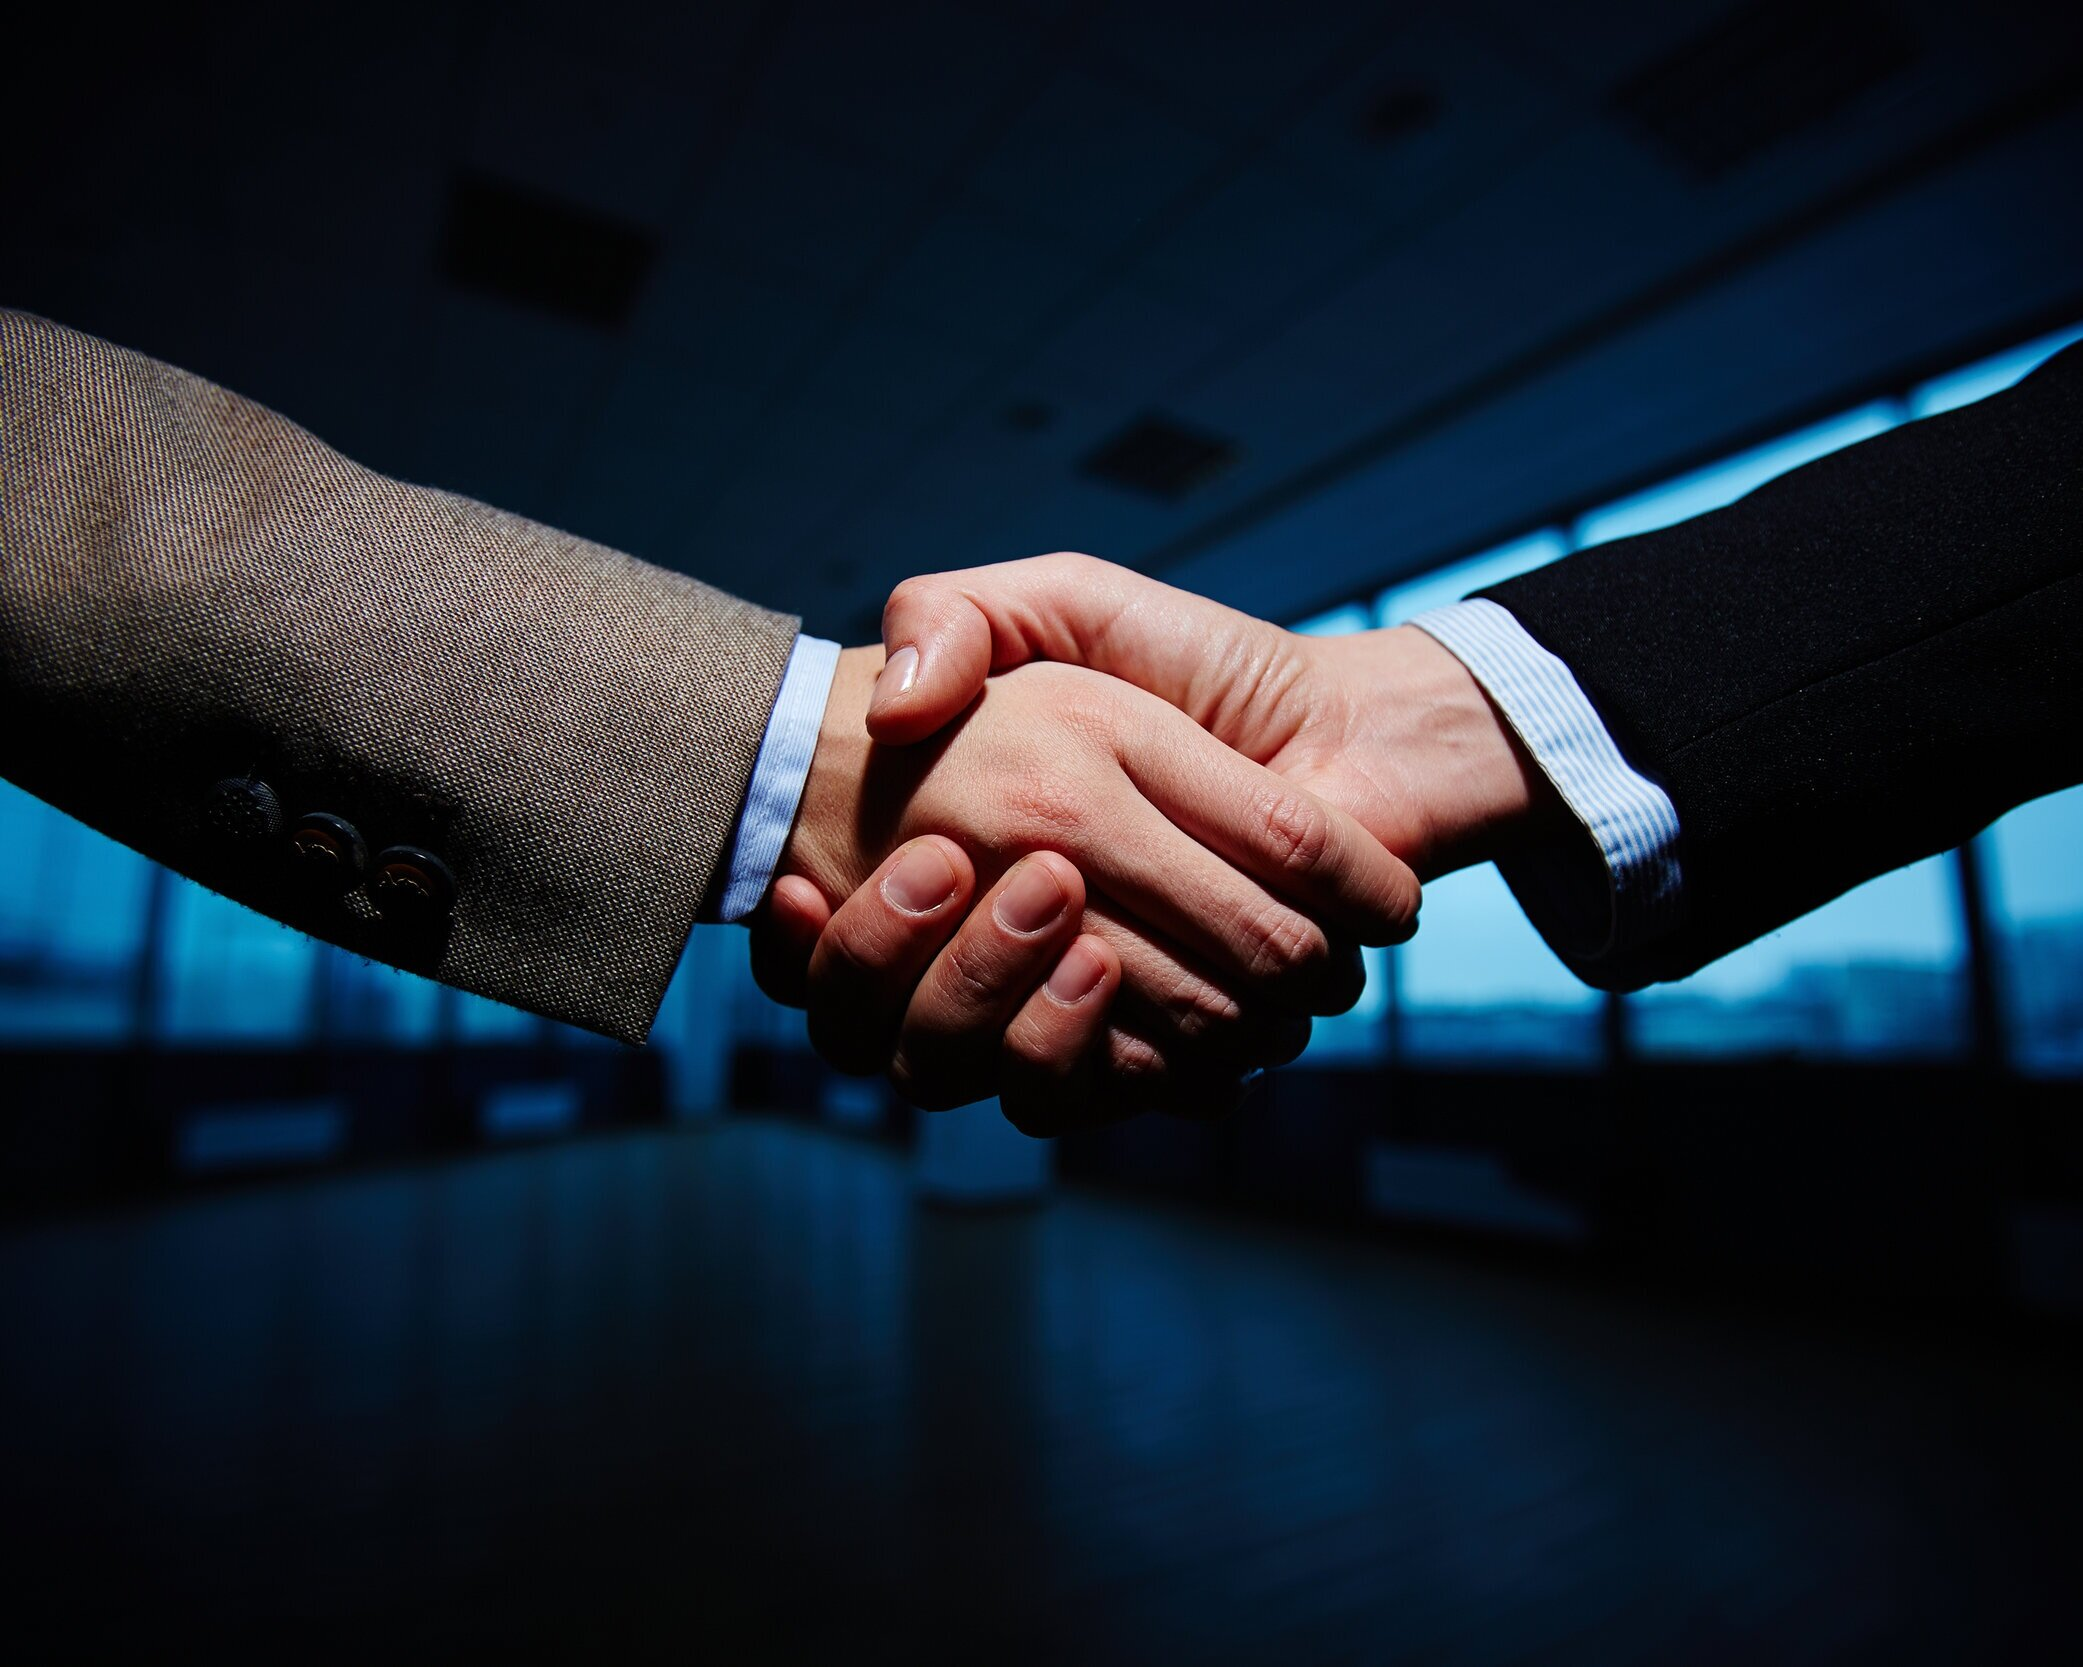 -handshake-of-business-partners.jpg